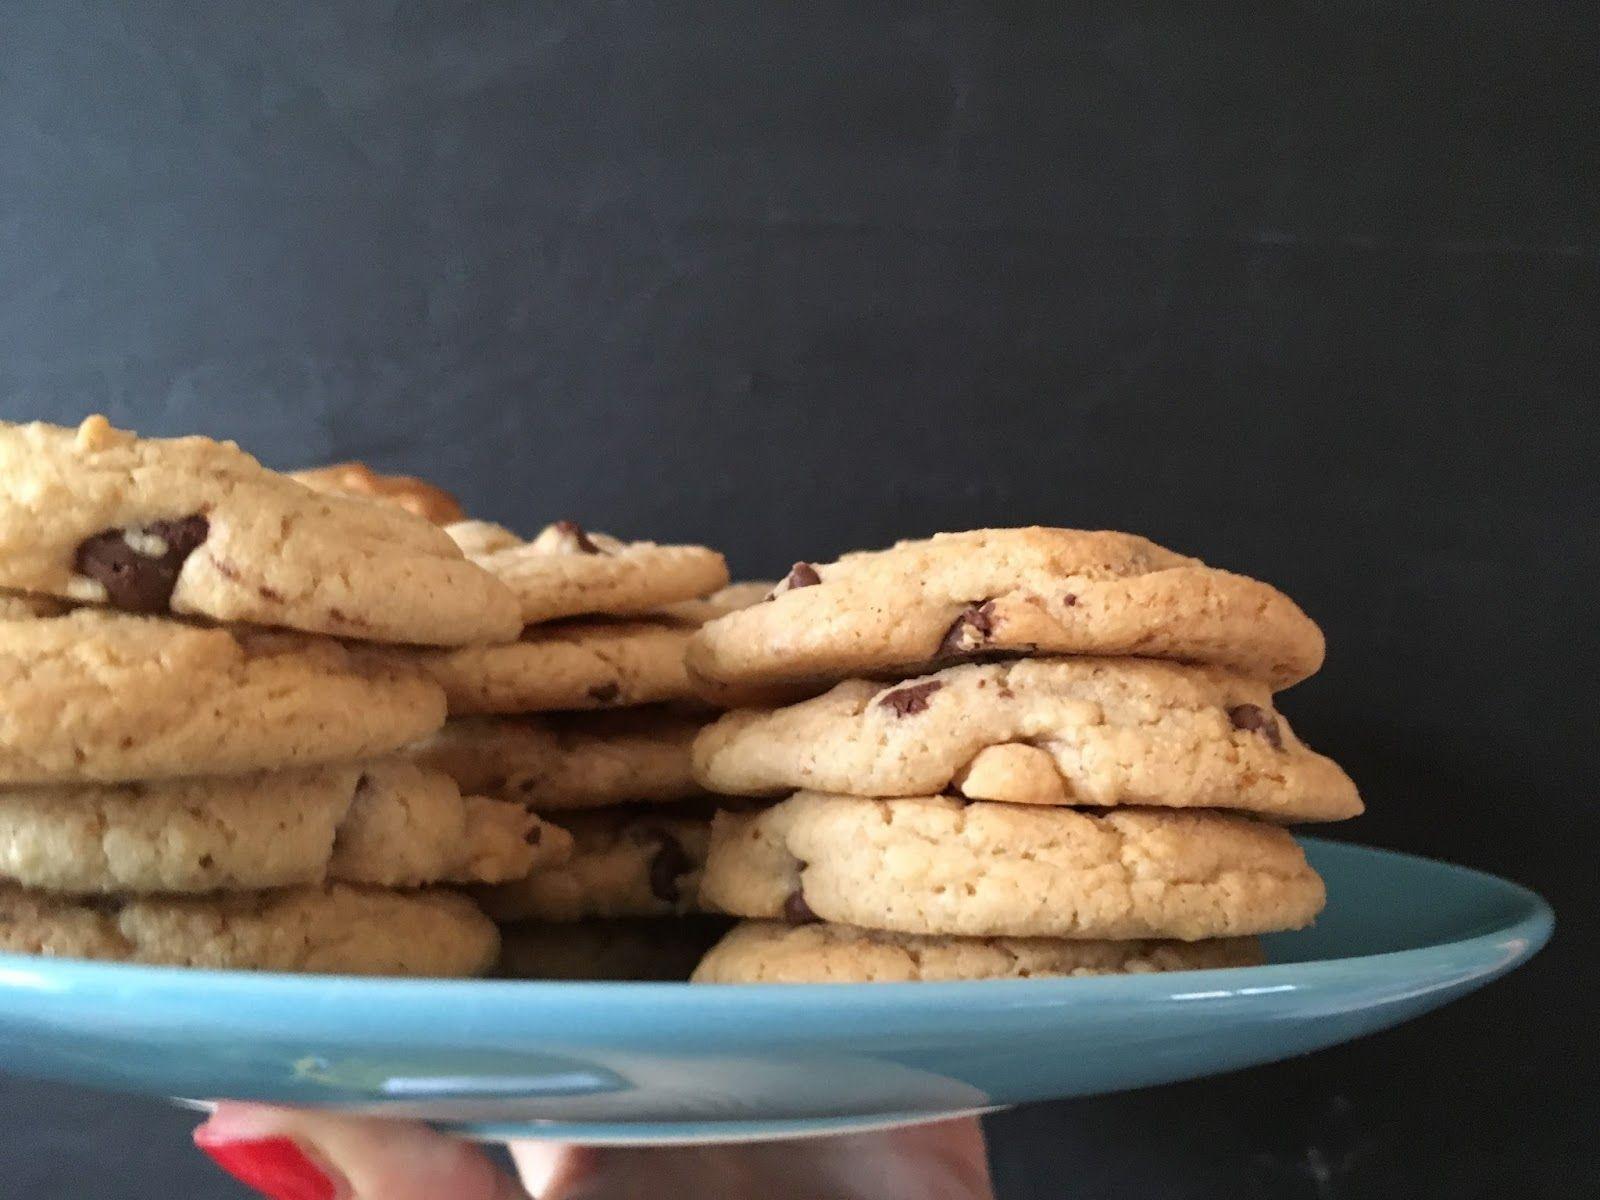 Chocolate Chip Cookies backen